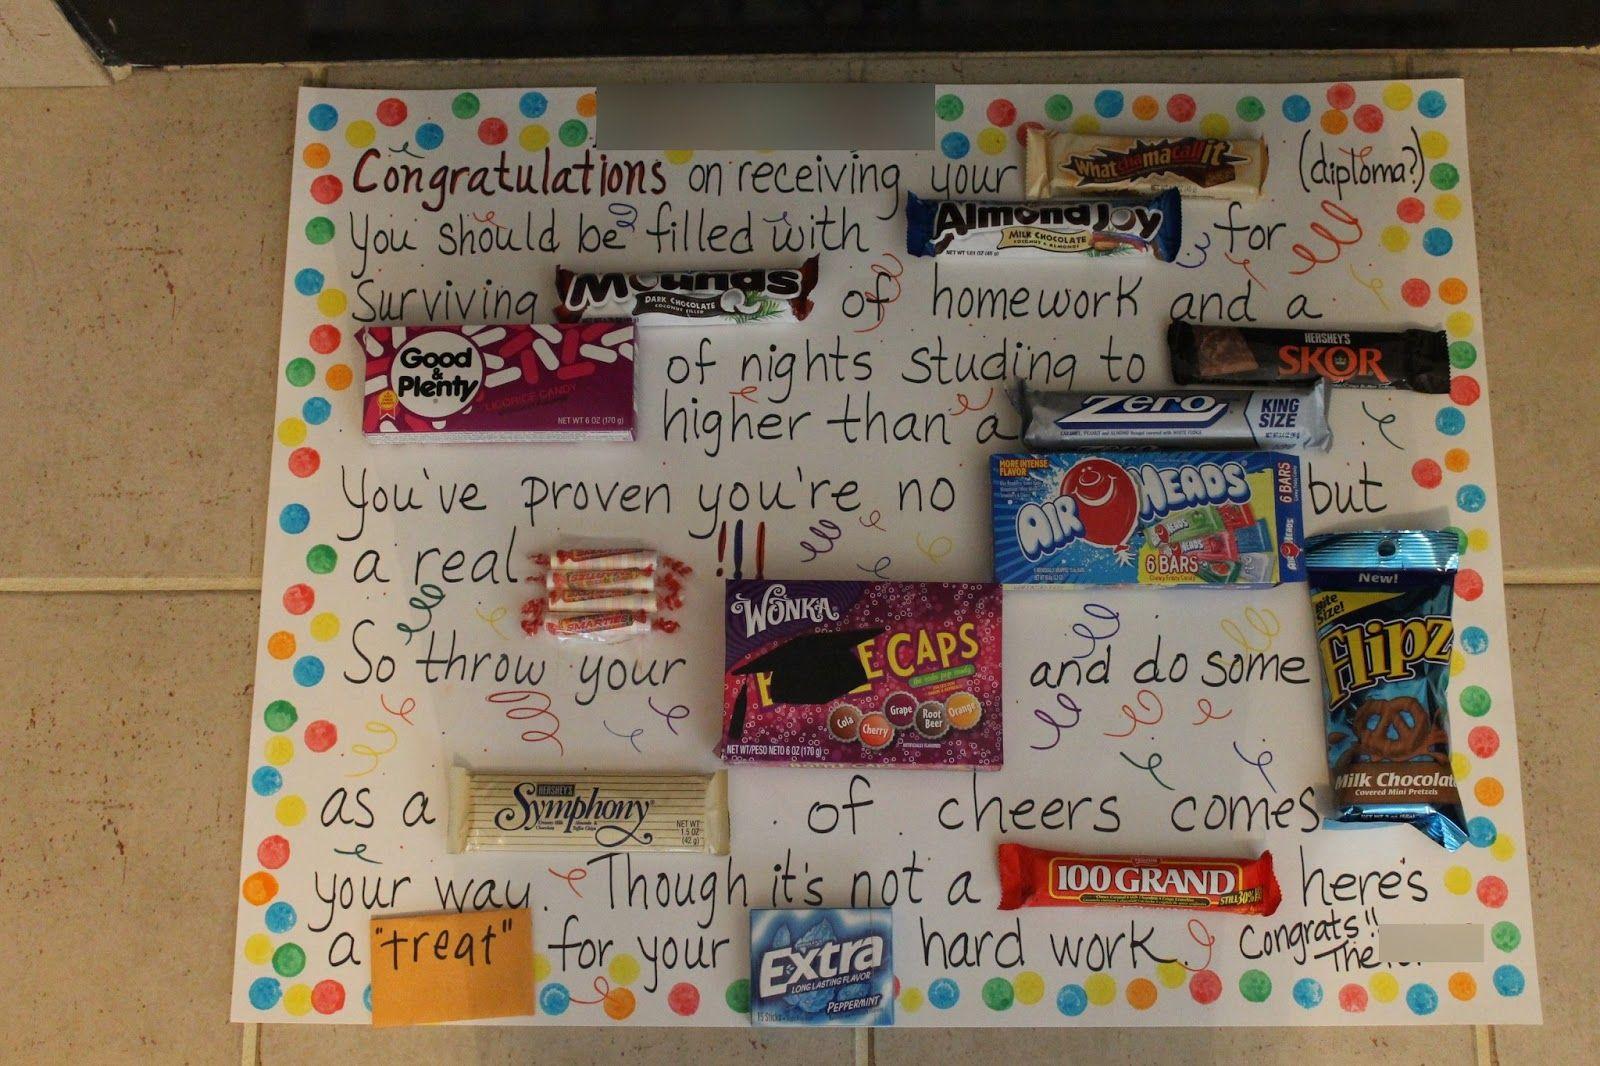 Graduation gift ideas candy grams pinterest graduation gifts graduation gift ideas negle Images